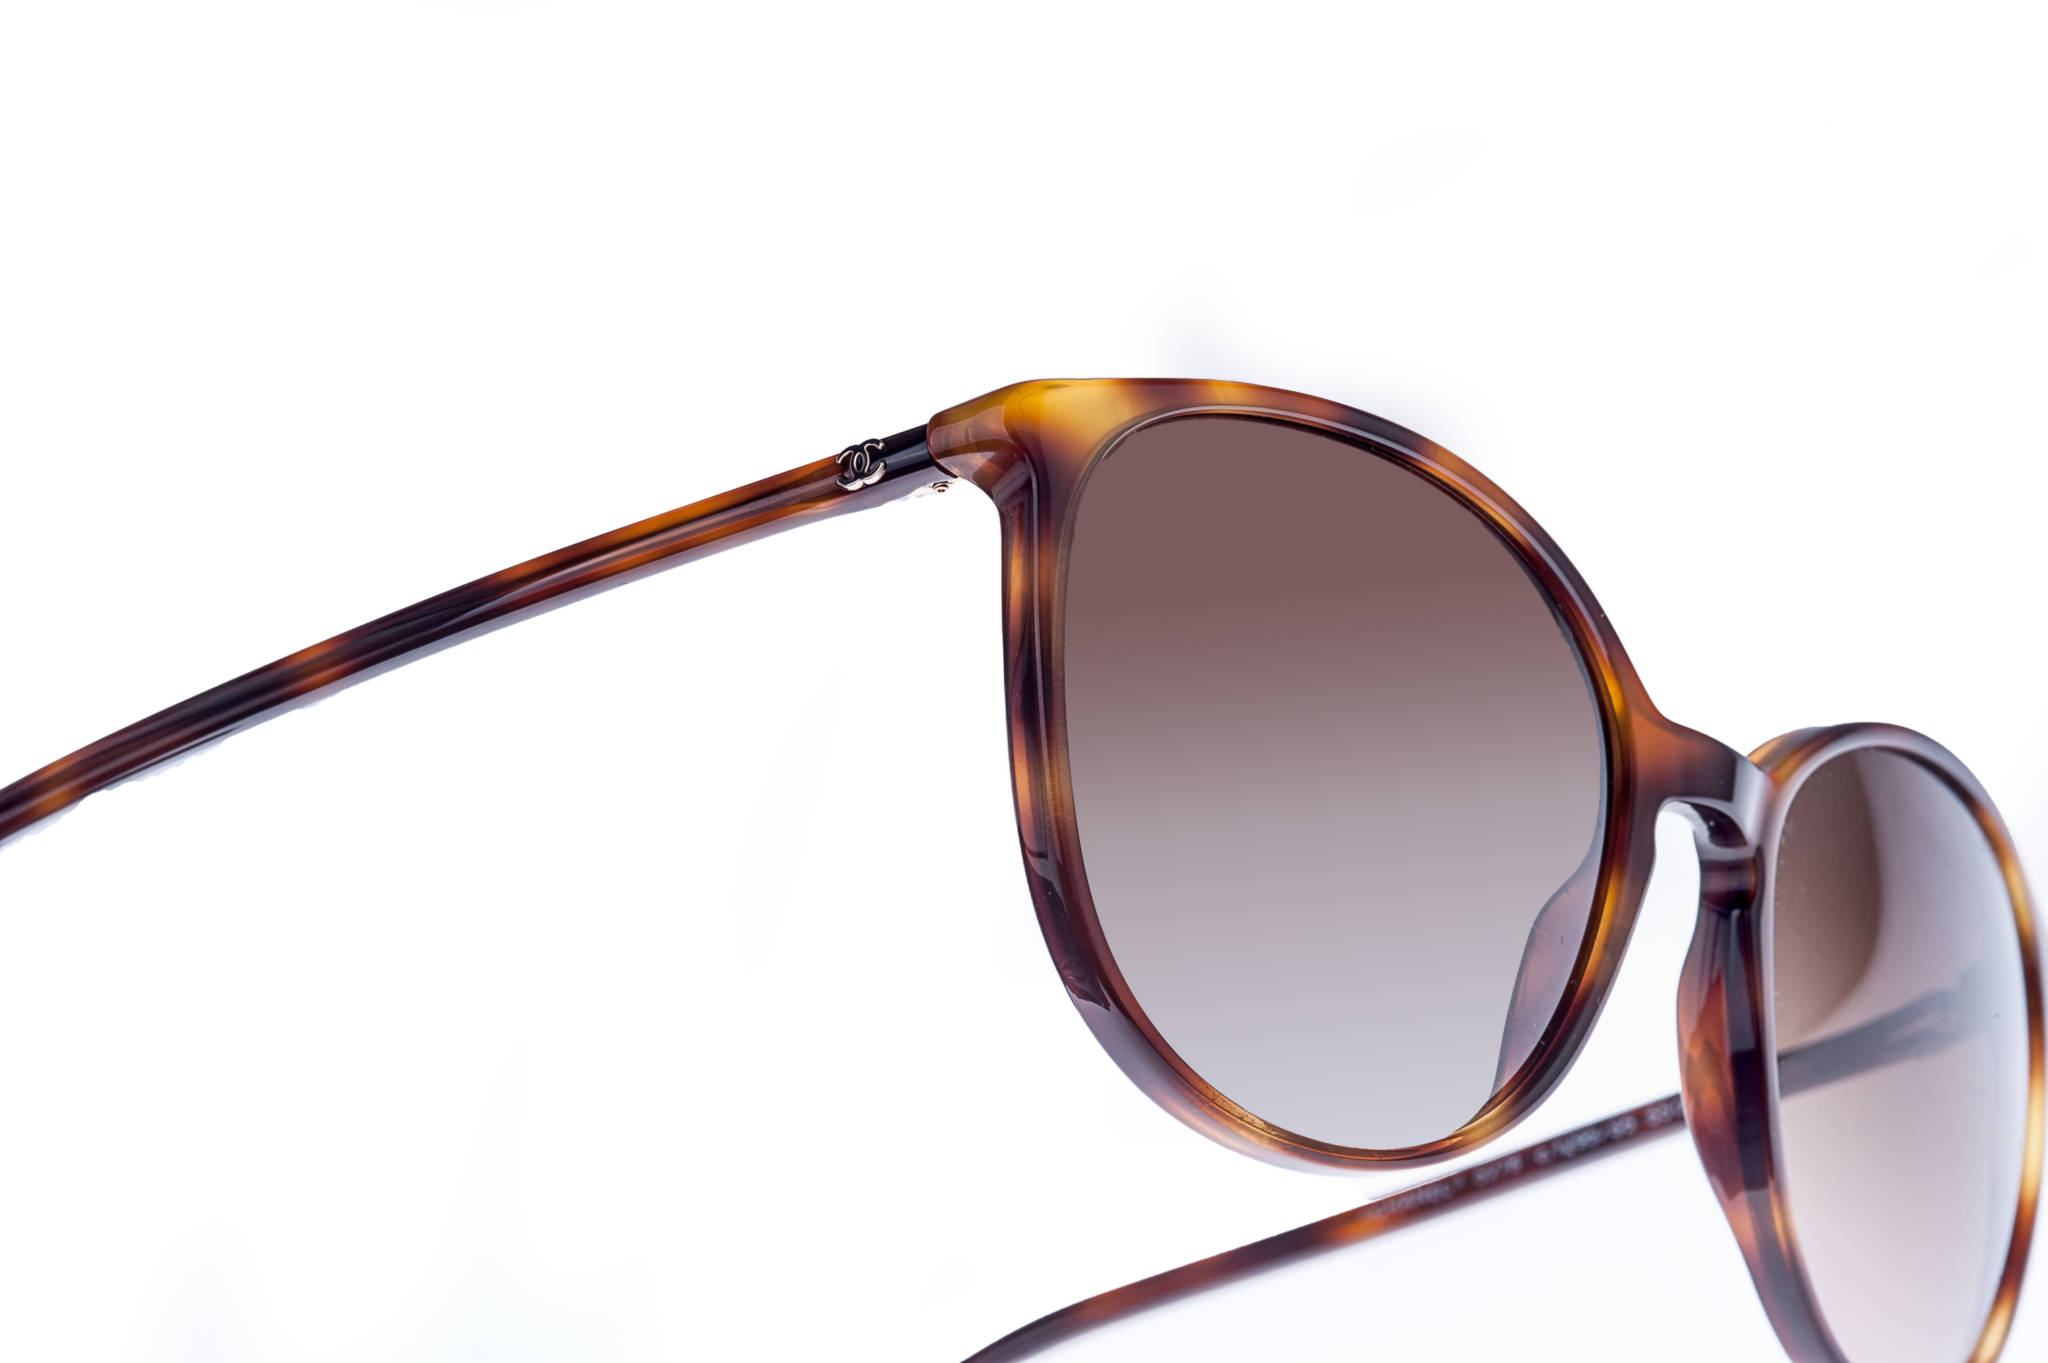 Chanel Sonnenbrille 5278 1295/s5